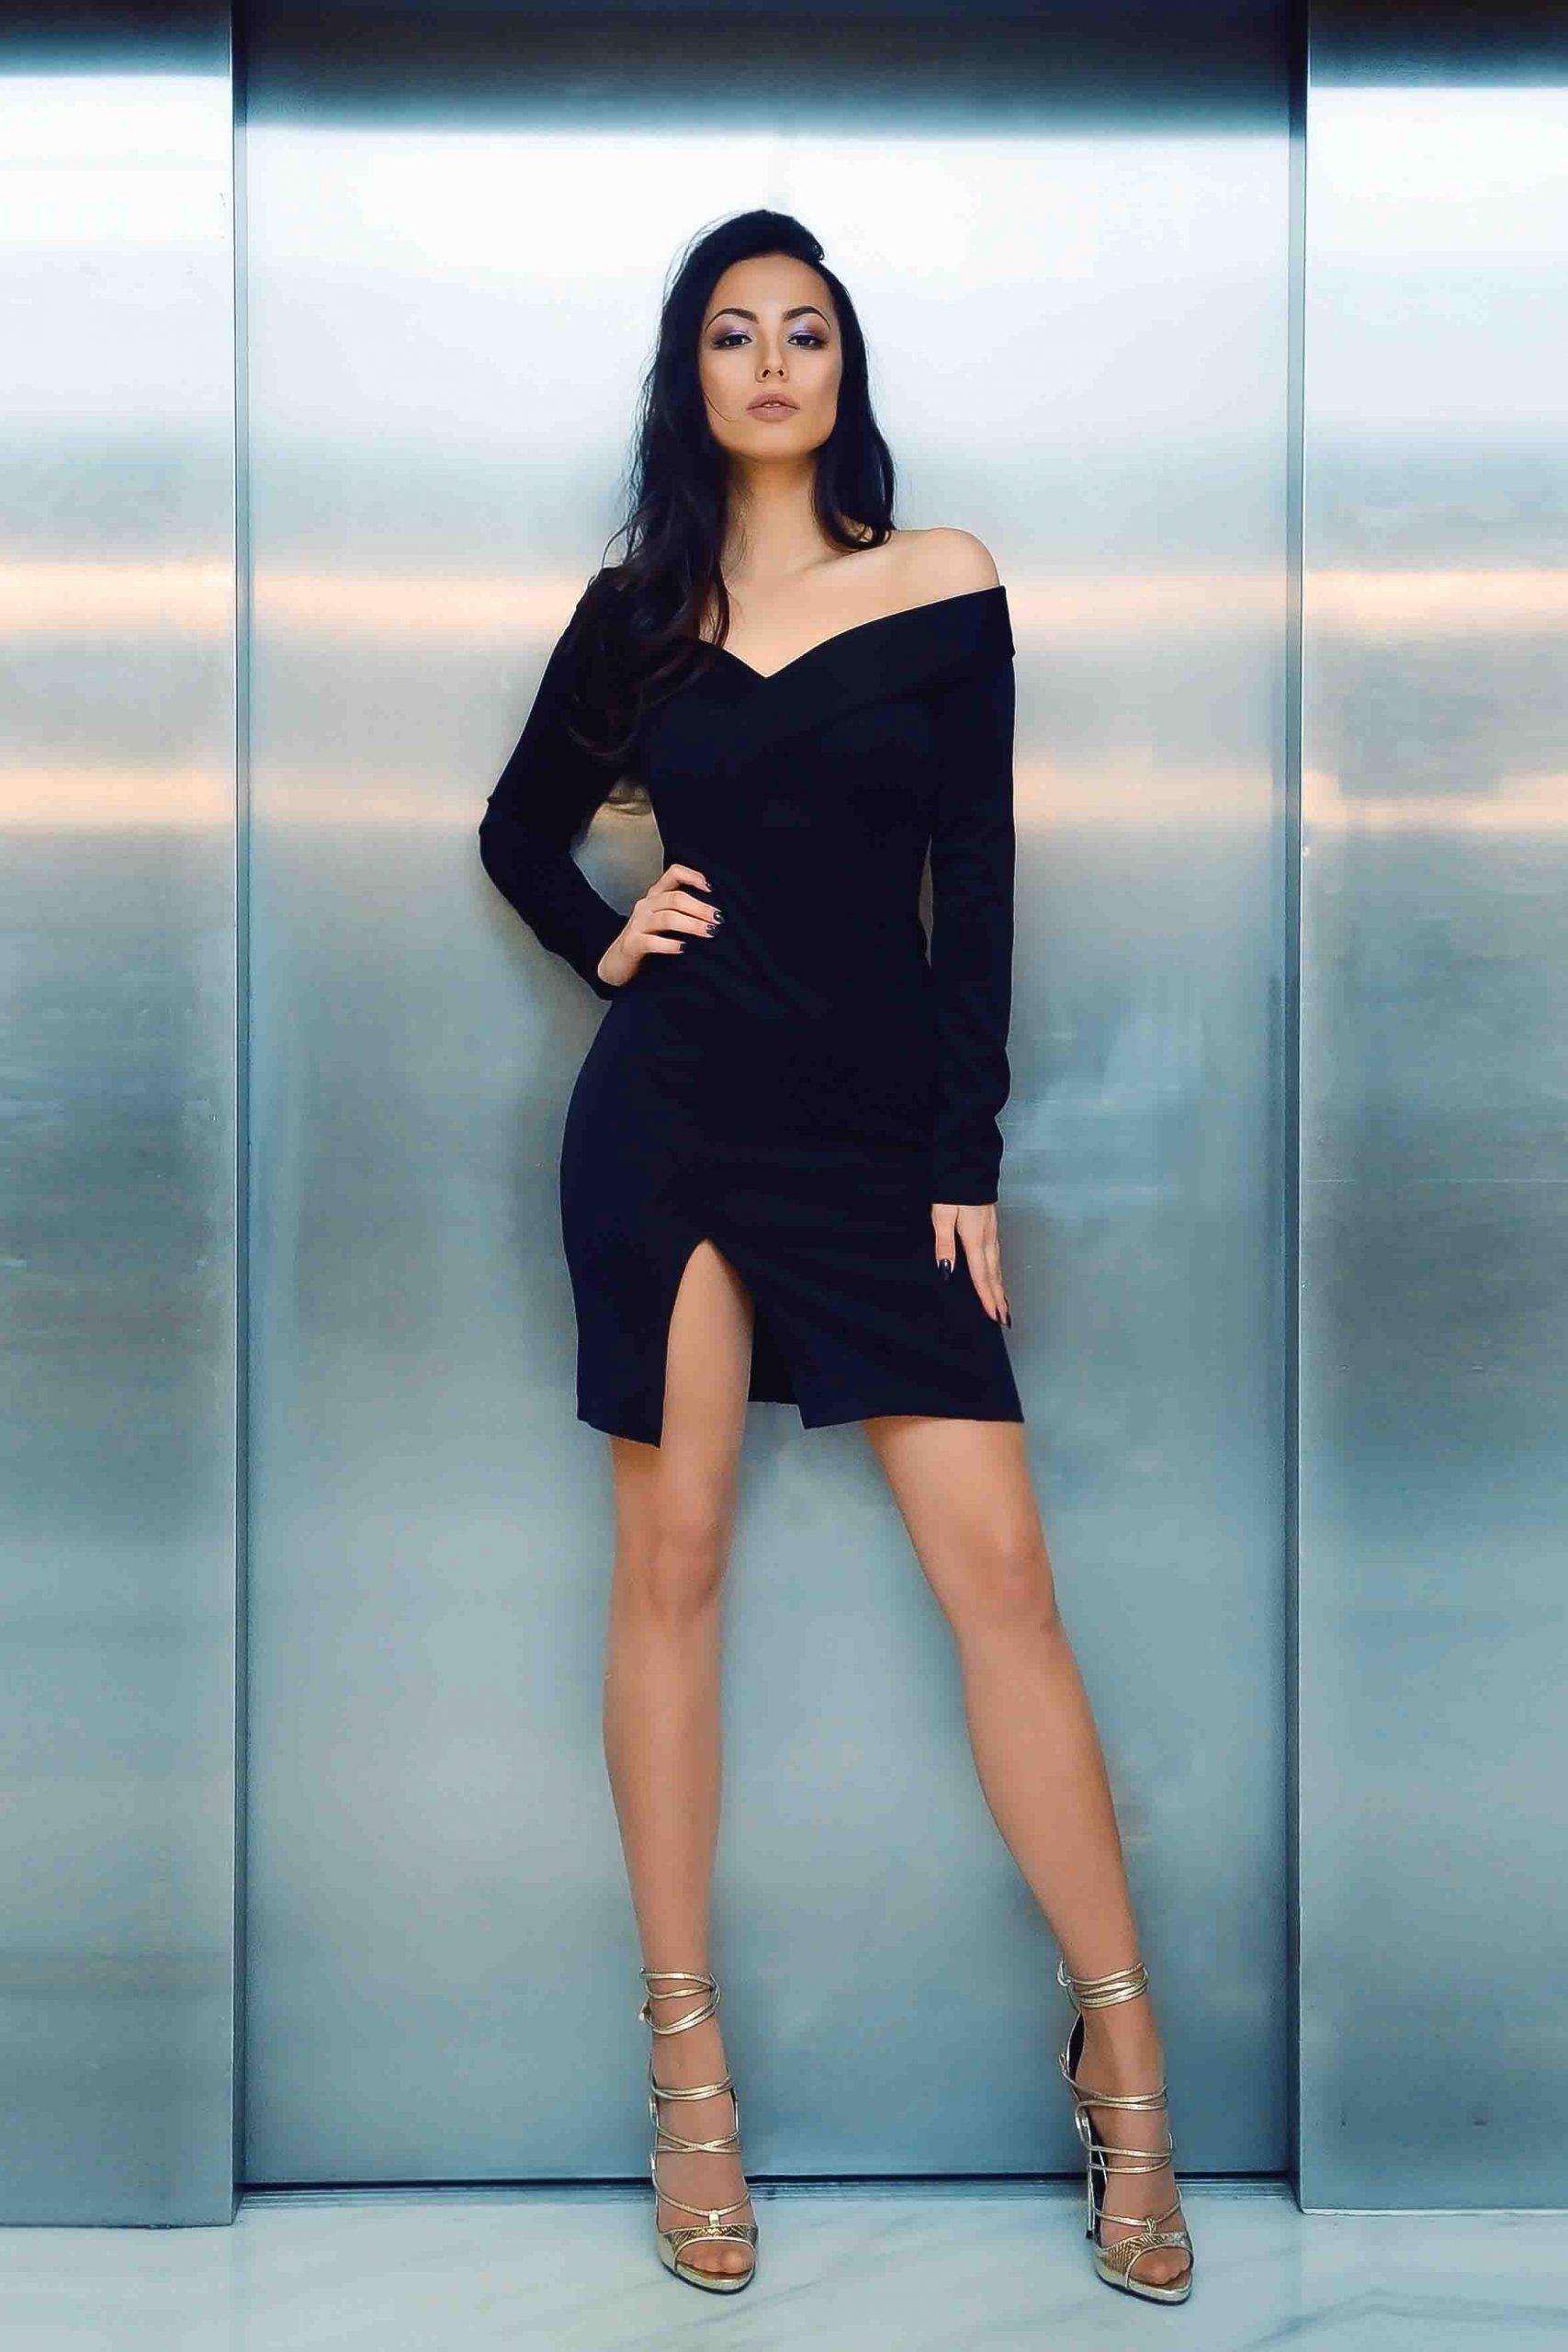 Heathrow escorts - leggy London model